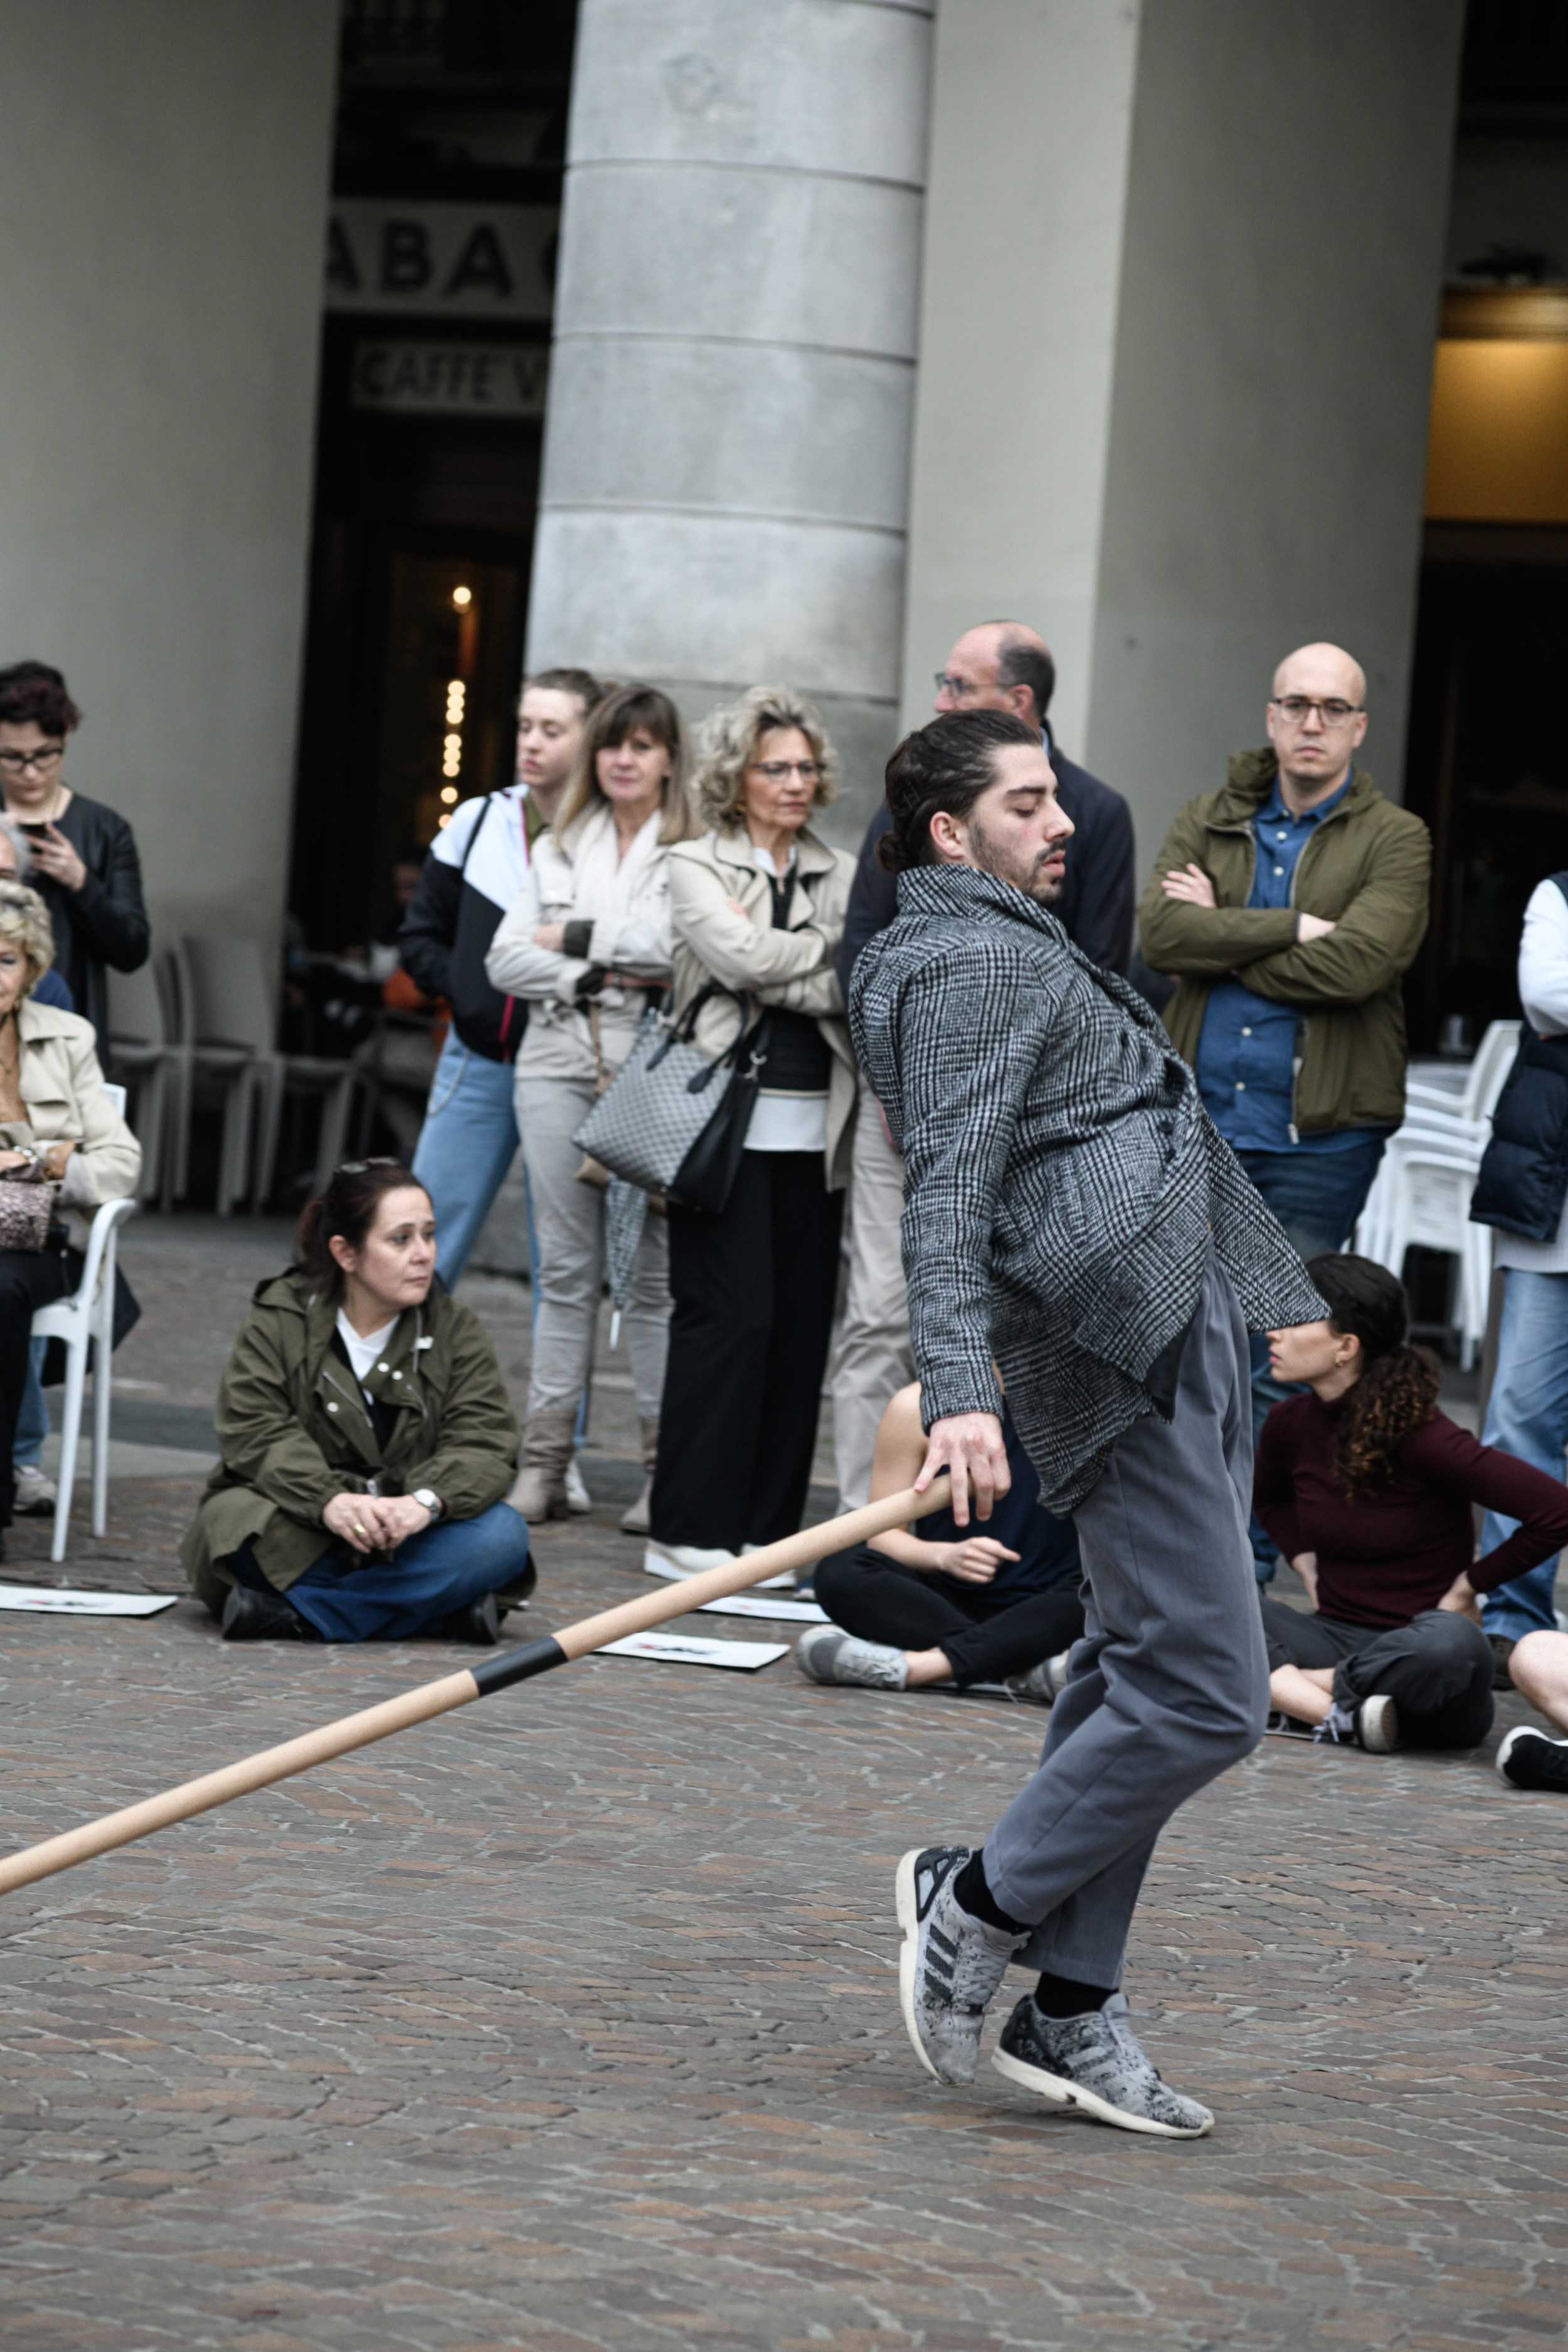 http://www.danzaurbana.eu/festival/wp-content/uploads/CARONTE_phAndreaMacchia_resize_2.jpg